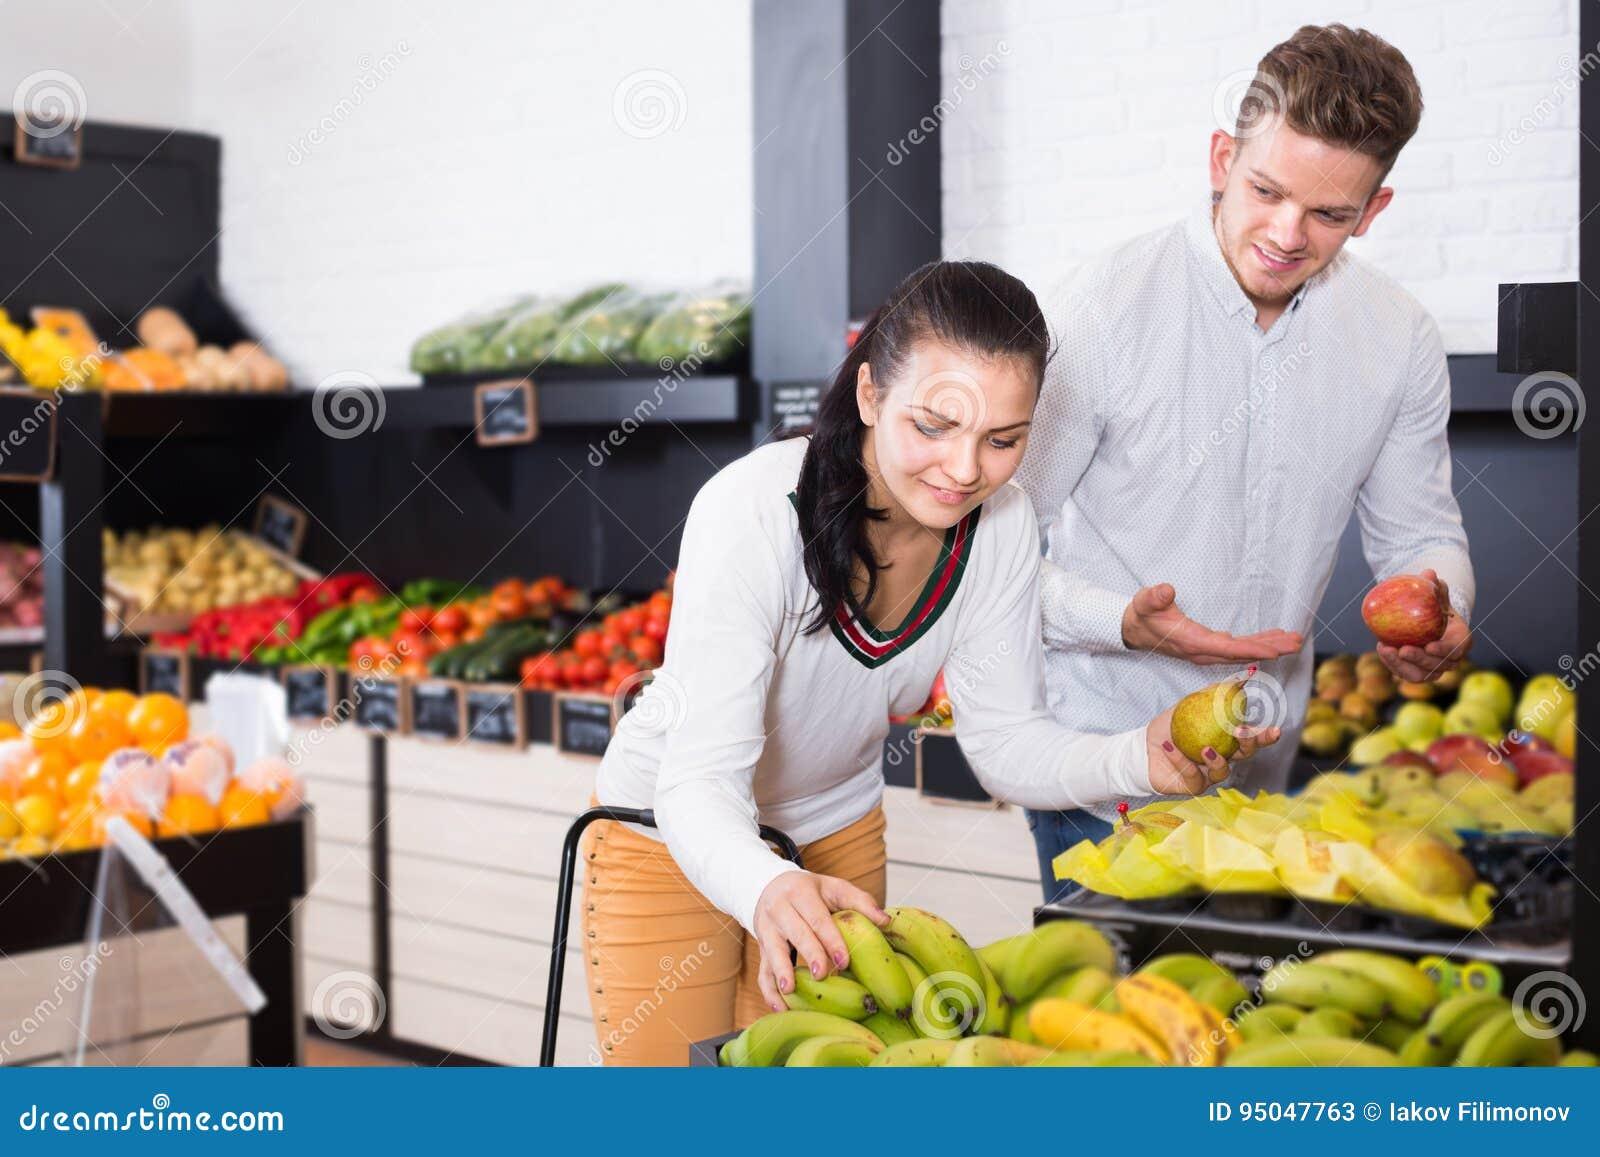 Positive woman and man choosing various fruits